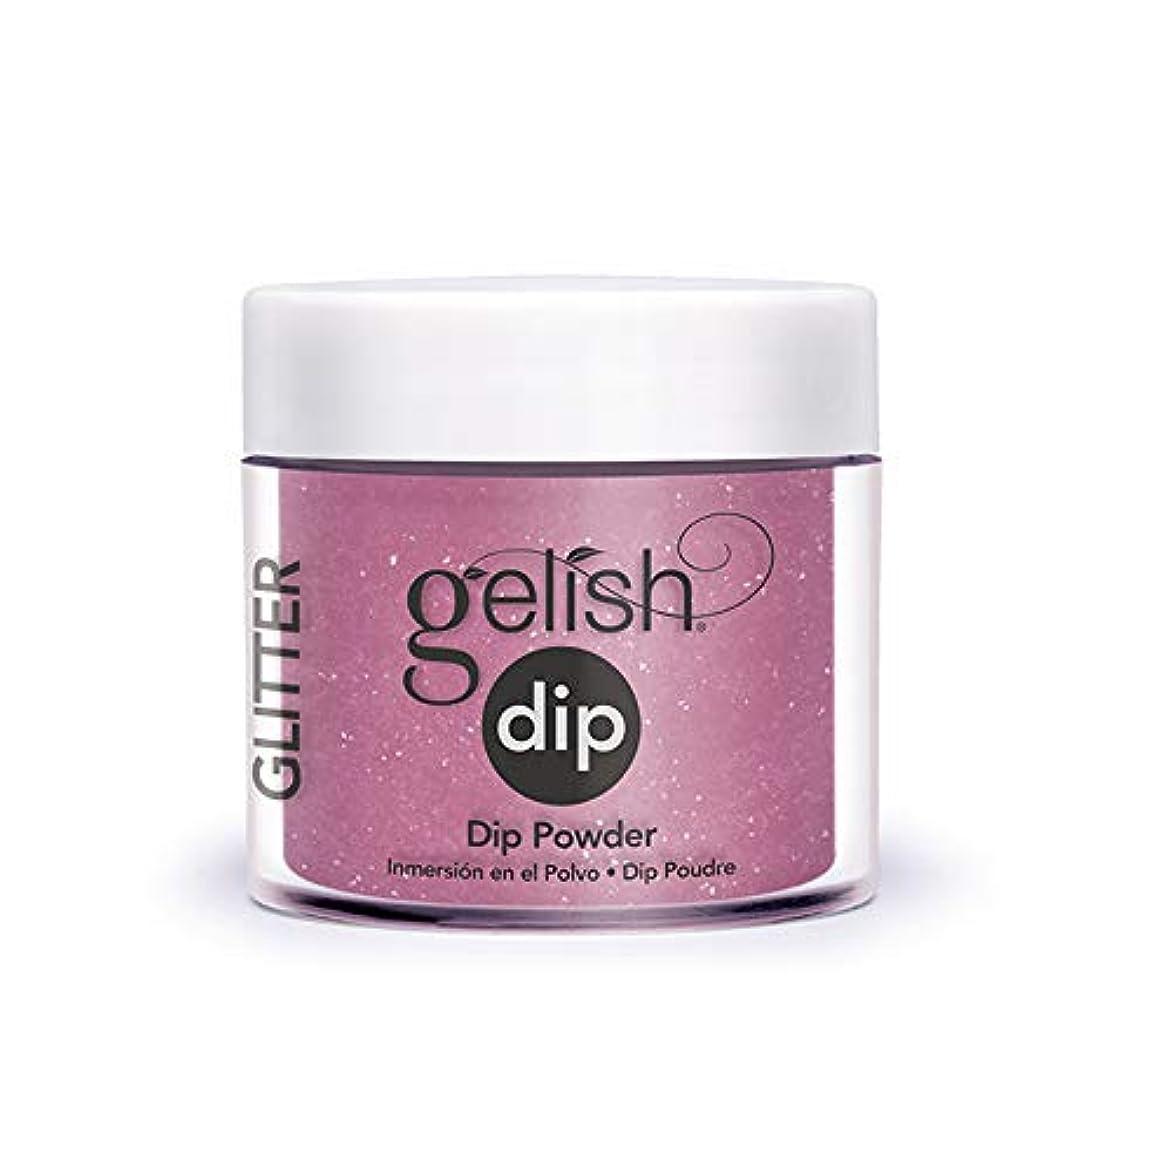 Harmony Gelish - Acrylic Dip Powder - High Bridge - 23g / 0.8oz